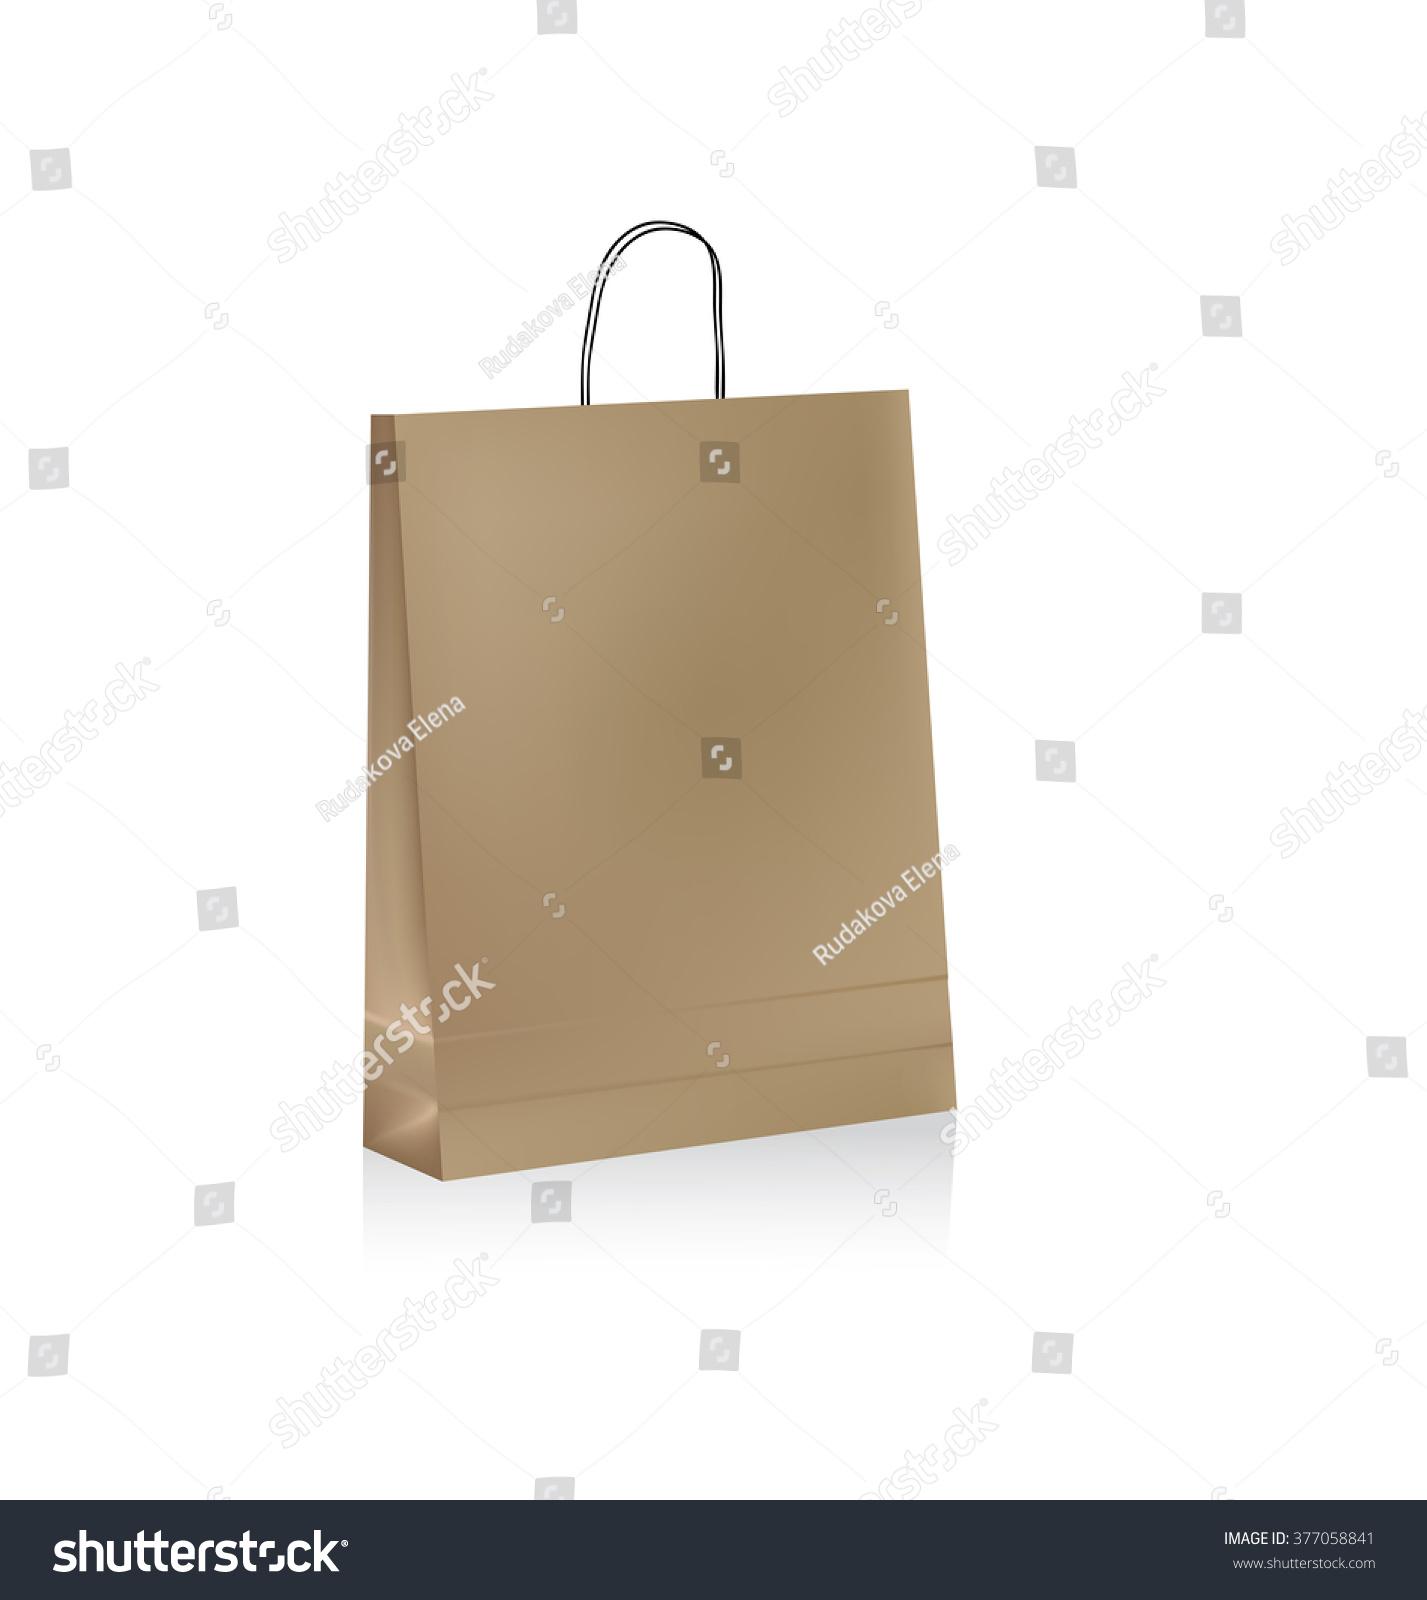 Paper bag vector - With Handles Brown Paper Bag Vector